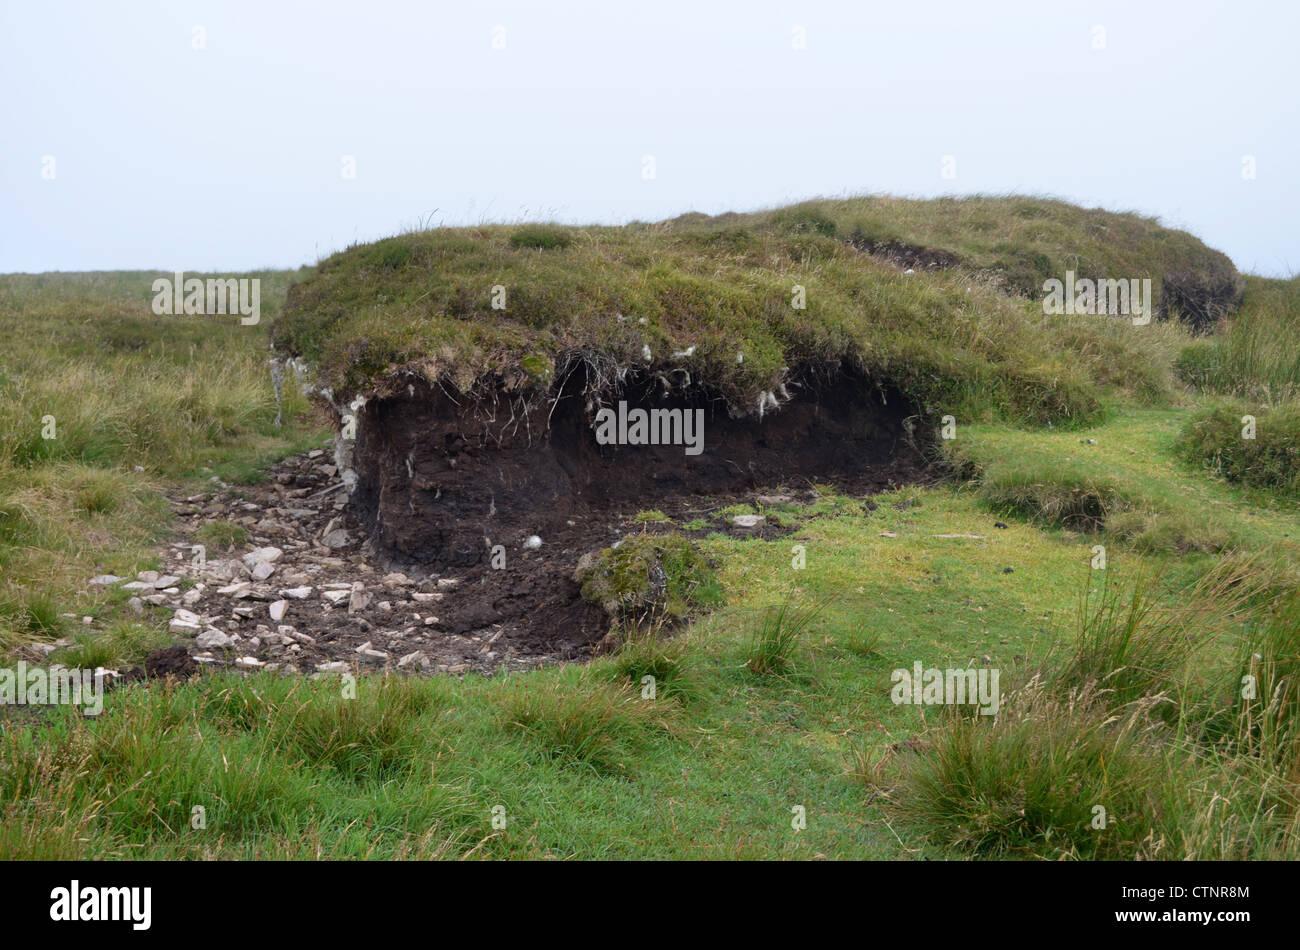 wind erosion number 3189 - Stock Image